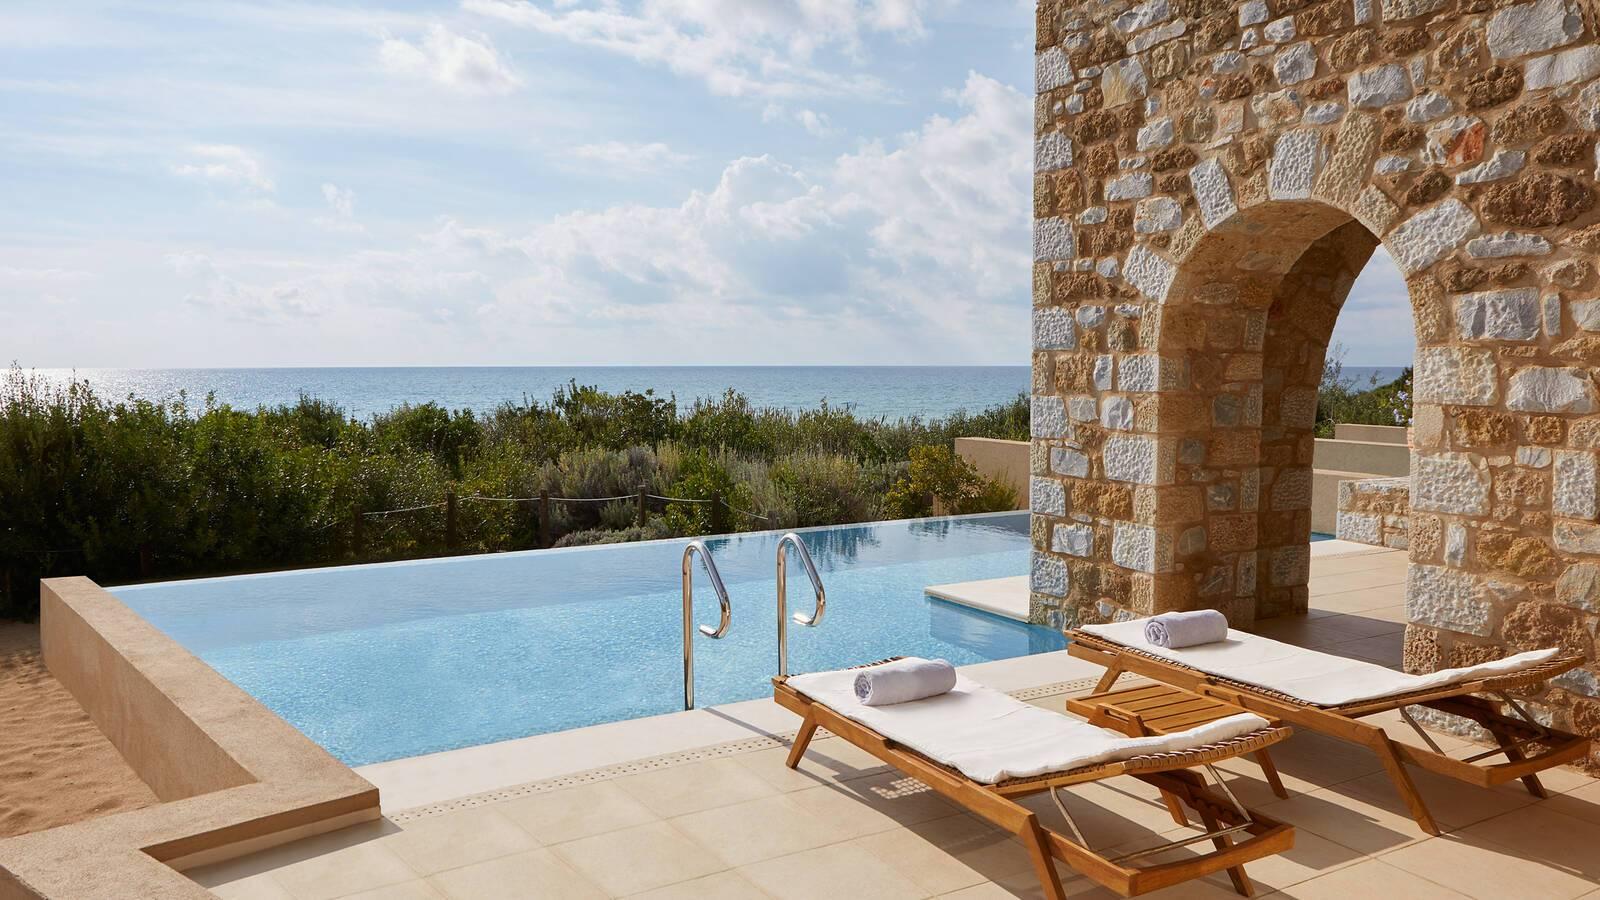 Costa Navarino Peloponnese Infinity Suite Piscine